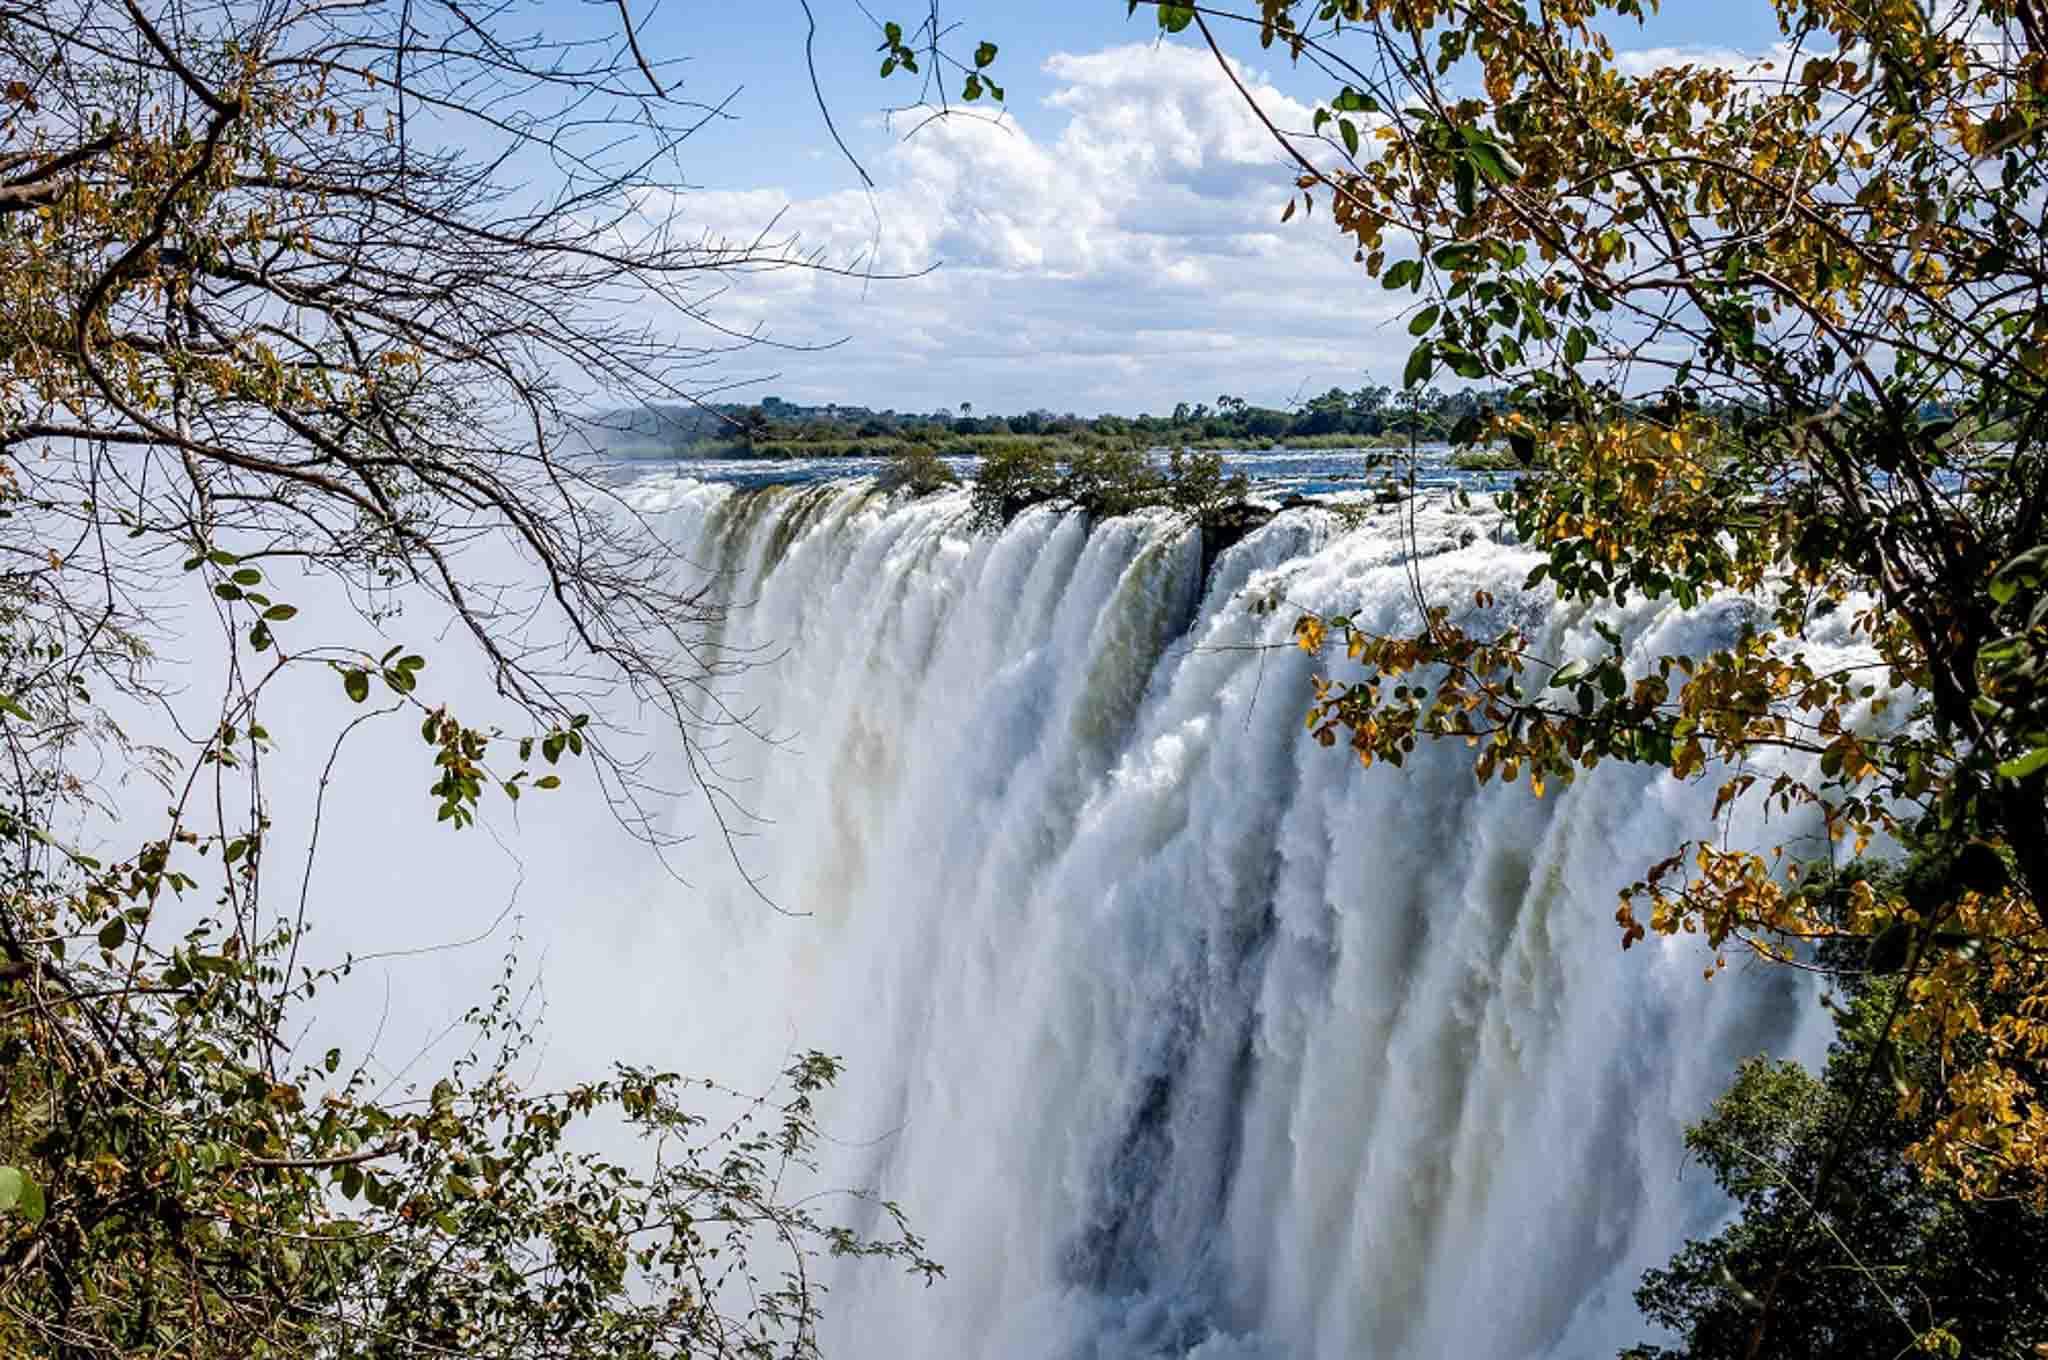 Huge water flow at Victoria Falls waterfall